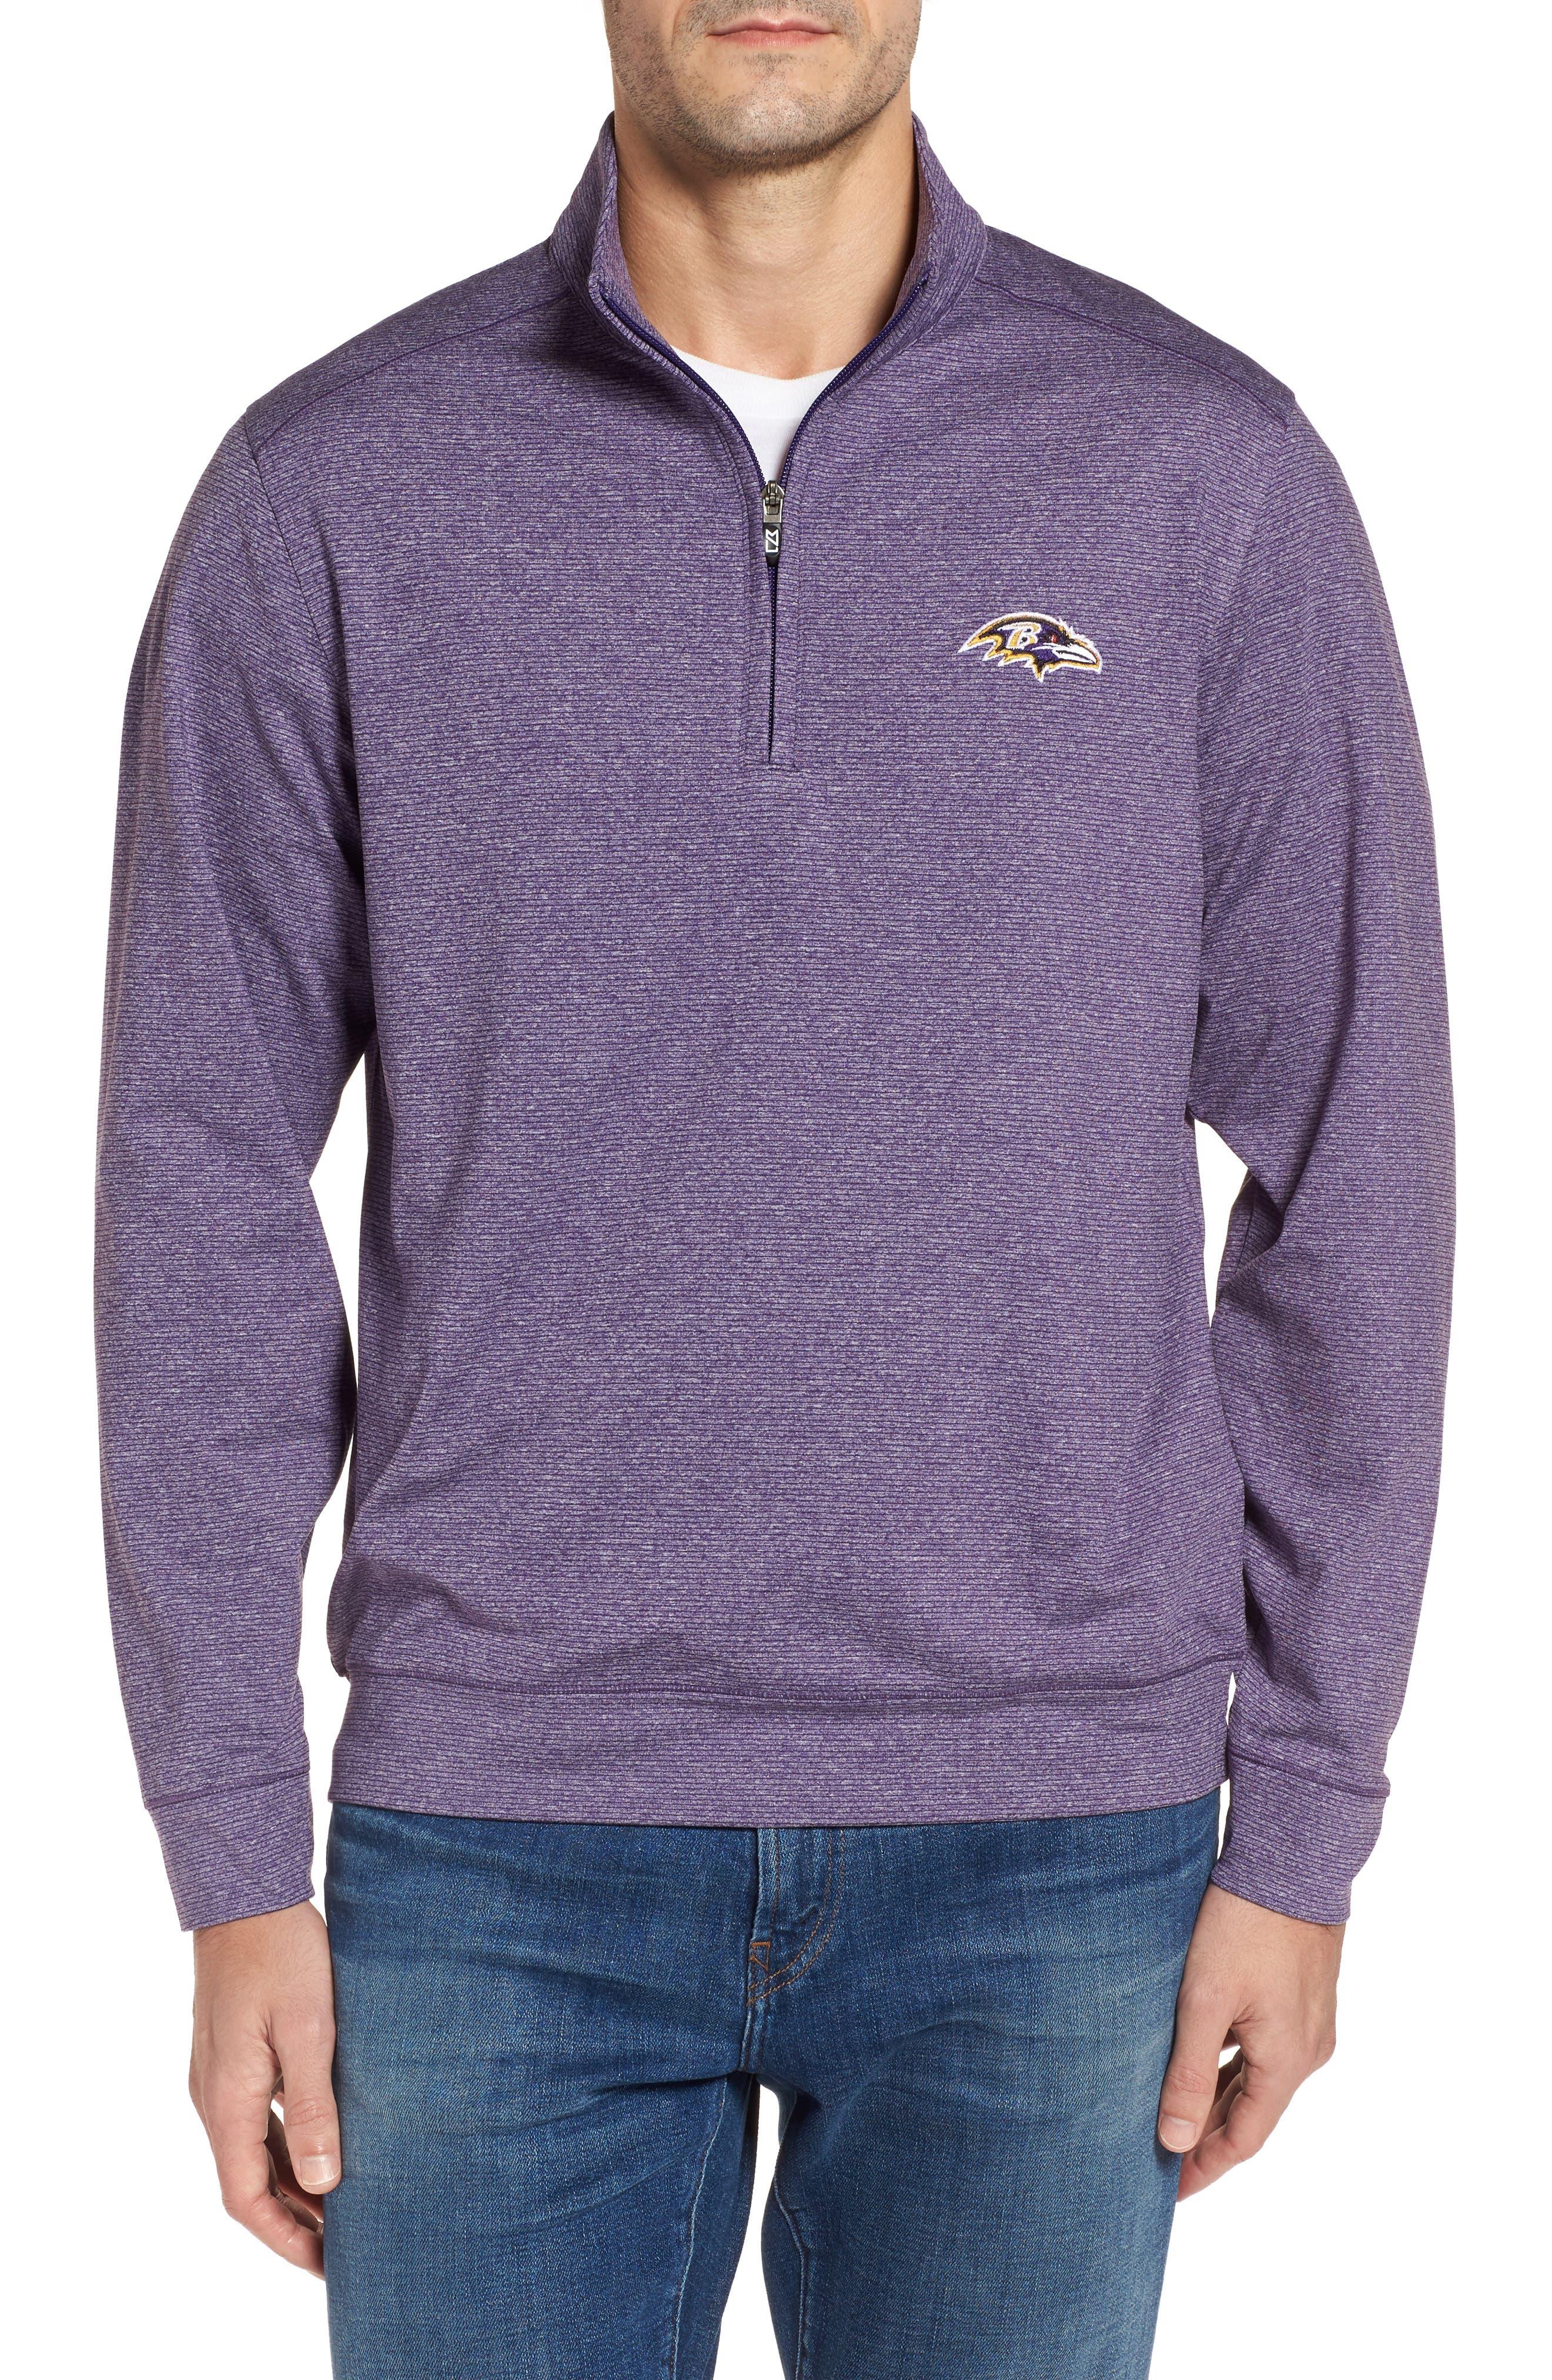 Shoreline - Baltimore Ravens Half Zip Pullover,                             Main thumbnail 1, color,                             College Purple Heather